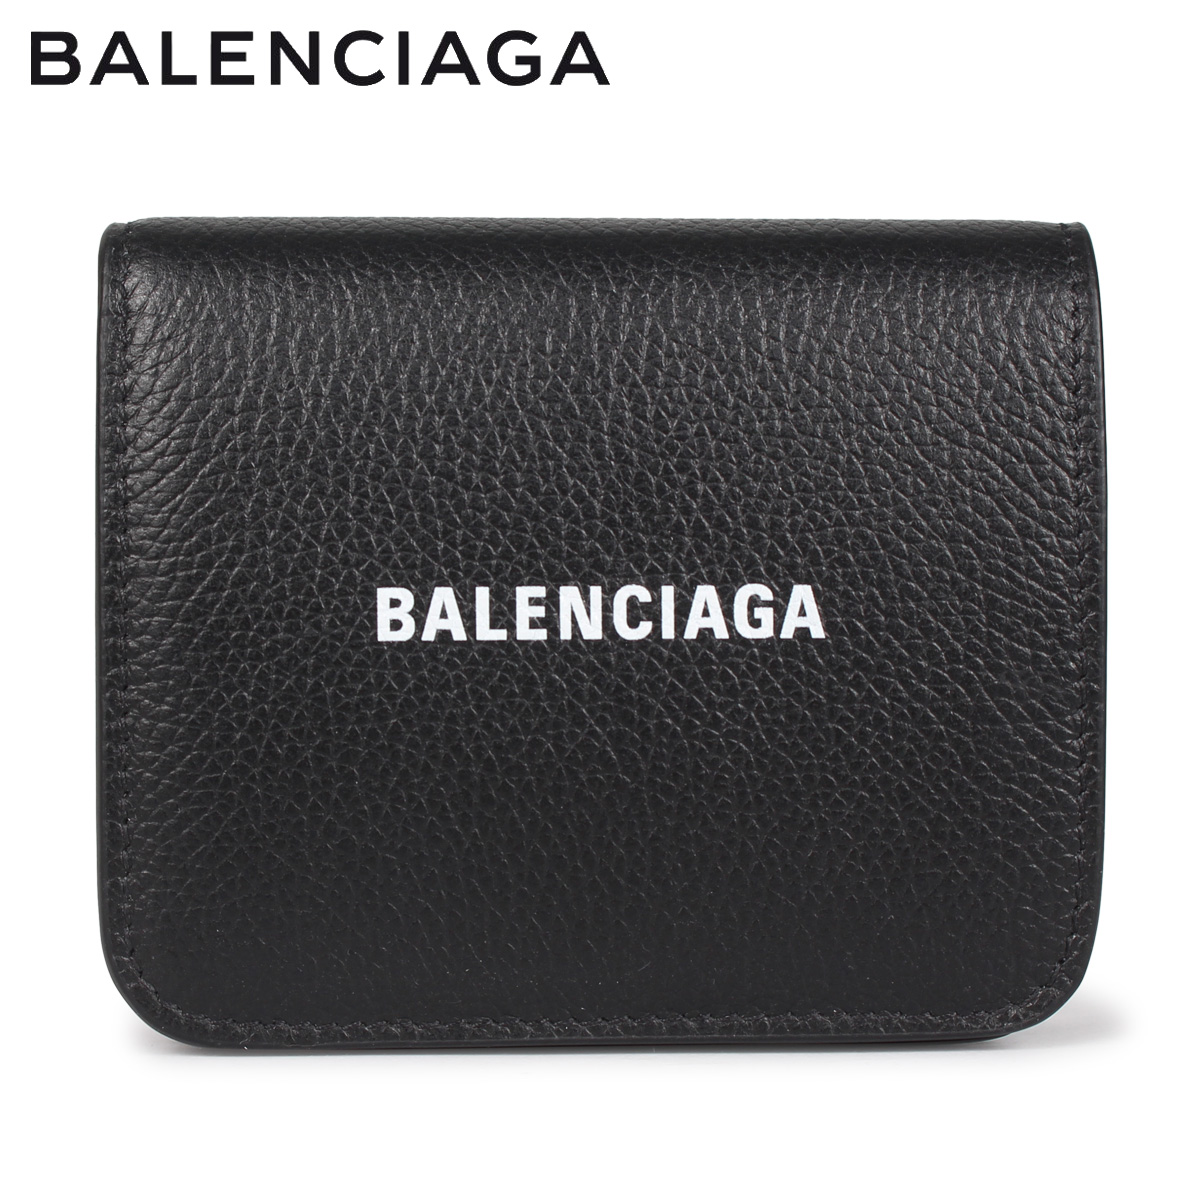 BALENCIAGA バレンシアガ 財布 二つ折り ミニ財布 メンズ レディース COIN AND CARD FLAP ブラック 黒 594216 [4/14 新入荷]